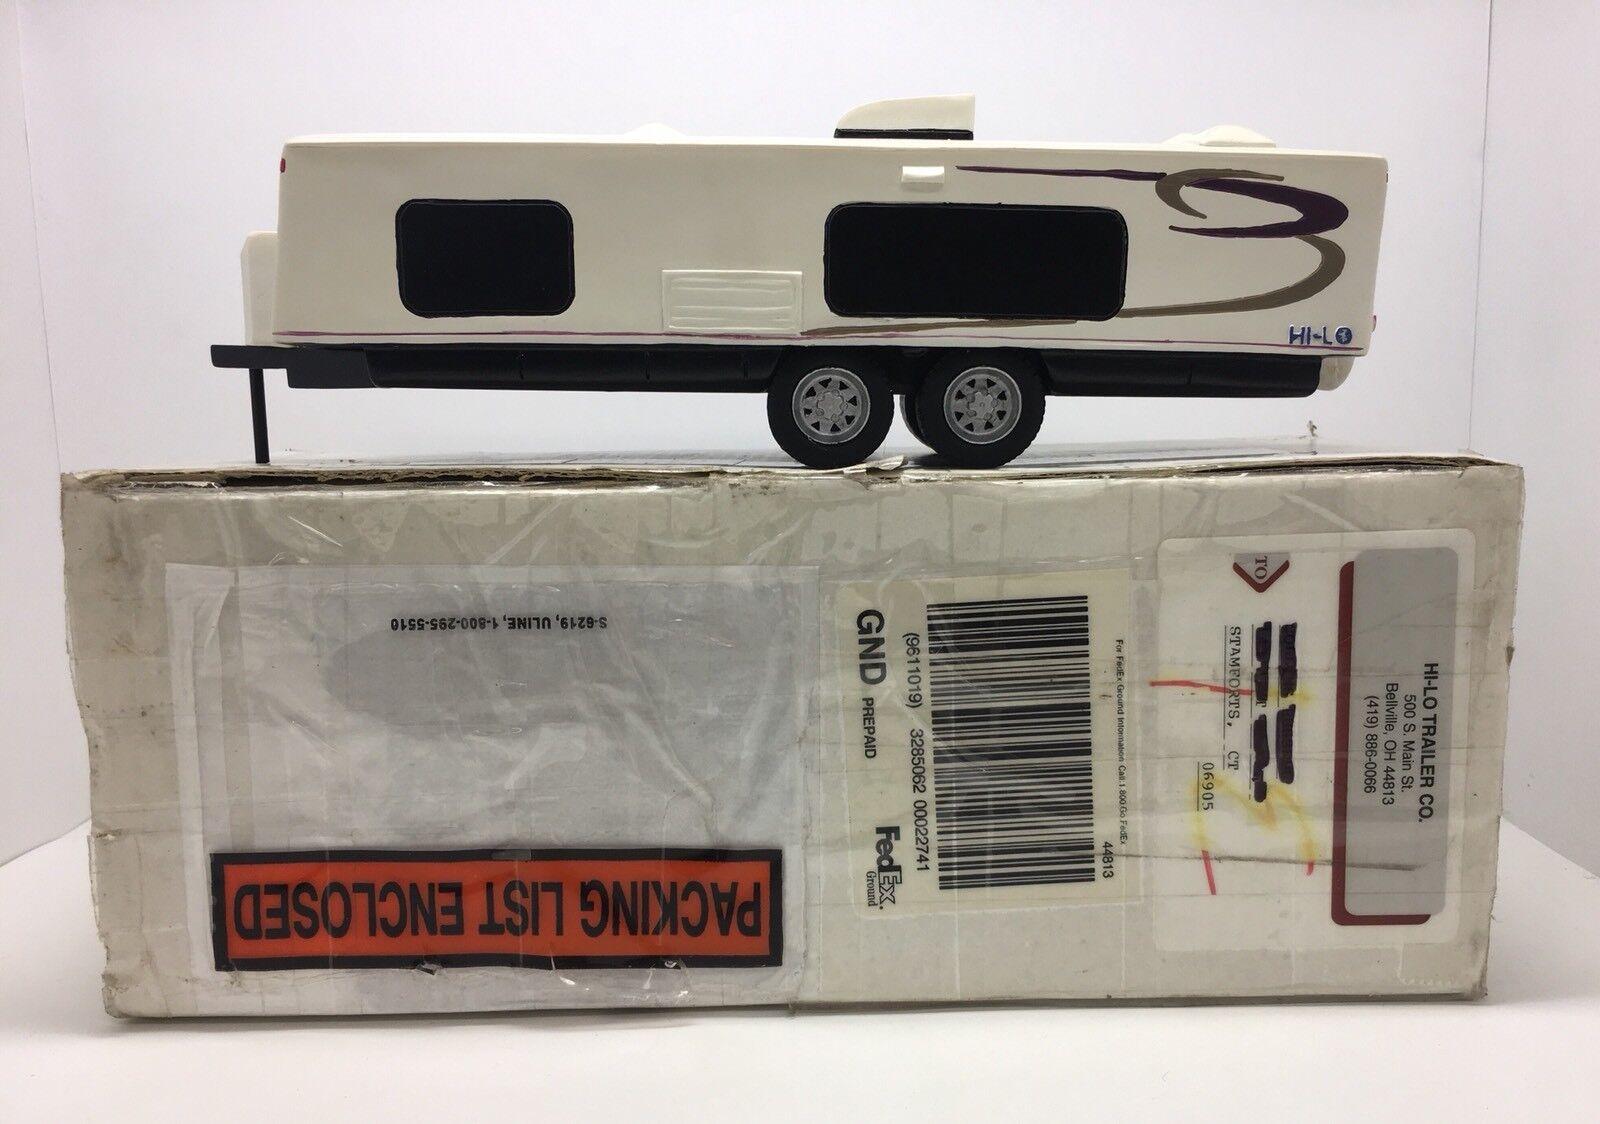 Hi-Lo Trailer - Camper - Caravan - 50th Anniversary Model Resin Toy - 2007